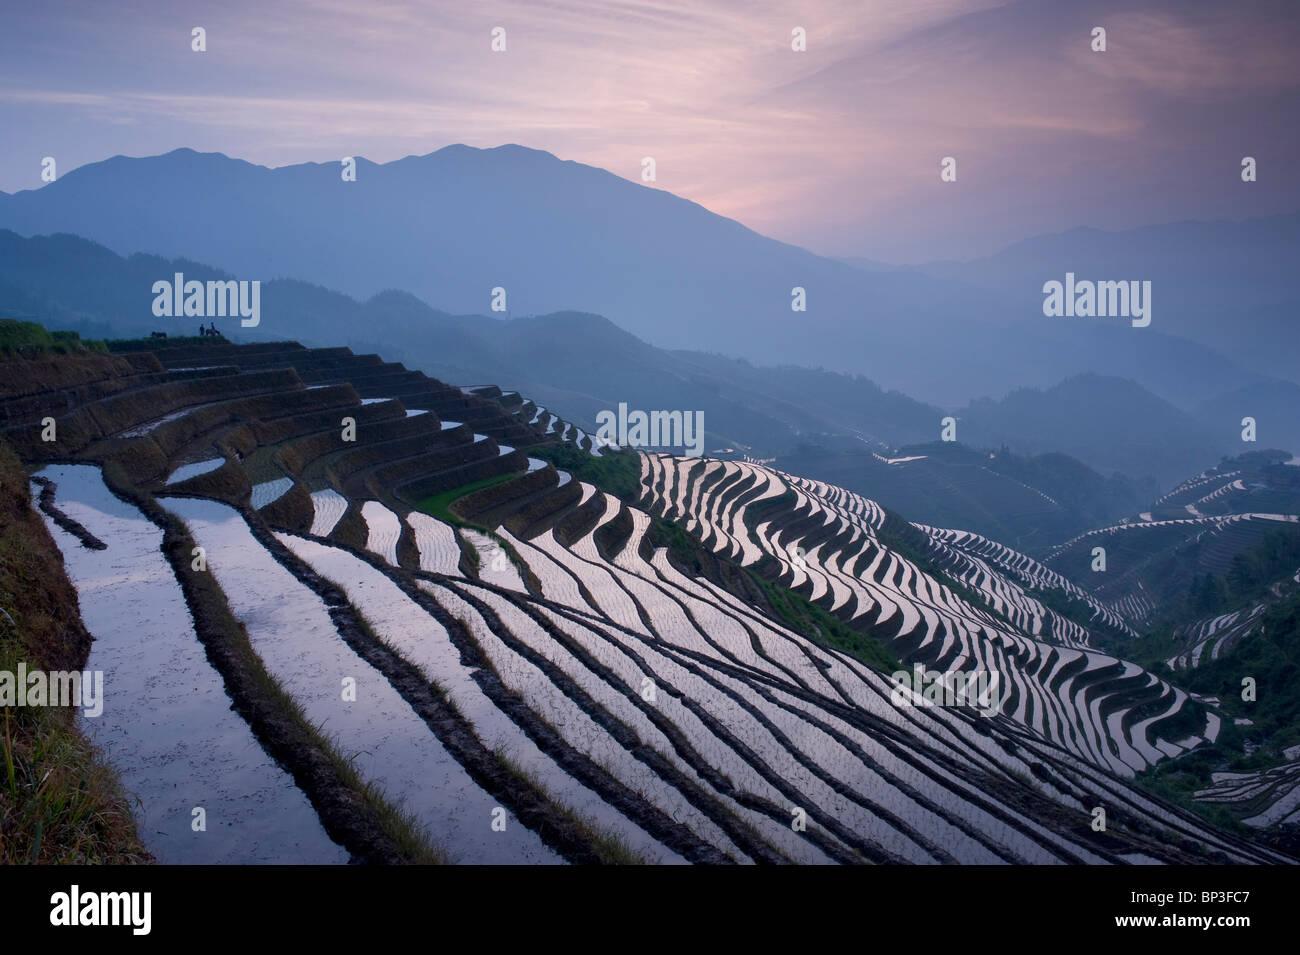 Atardecer en Dragon's Backbone terrazas de arroz cerca de la aldea de Dazhai Yao, provincia de Guangxi, China Foto de stock